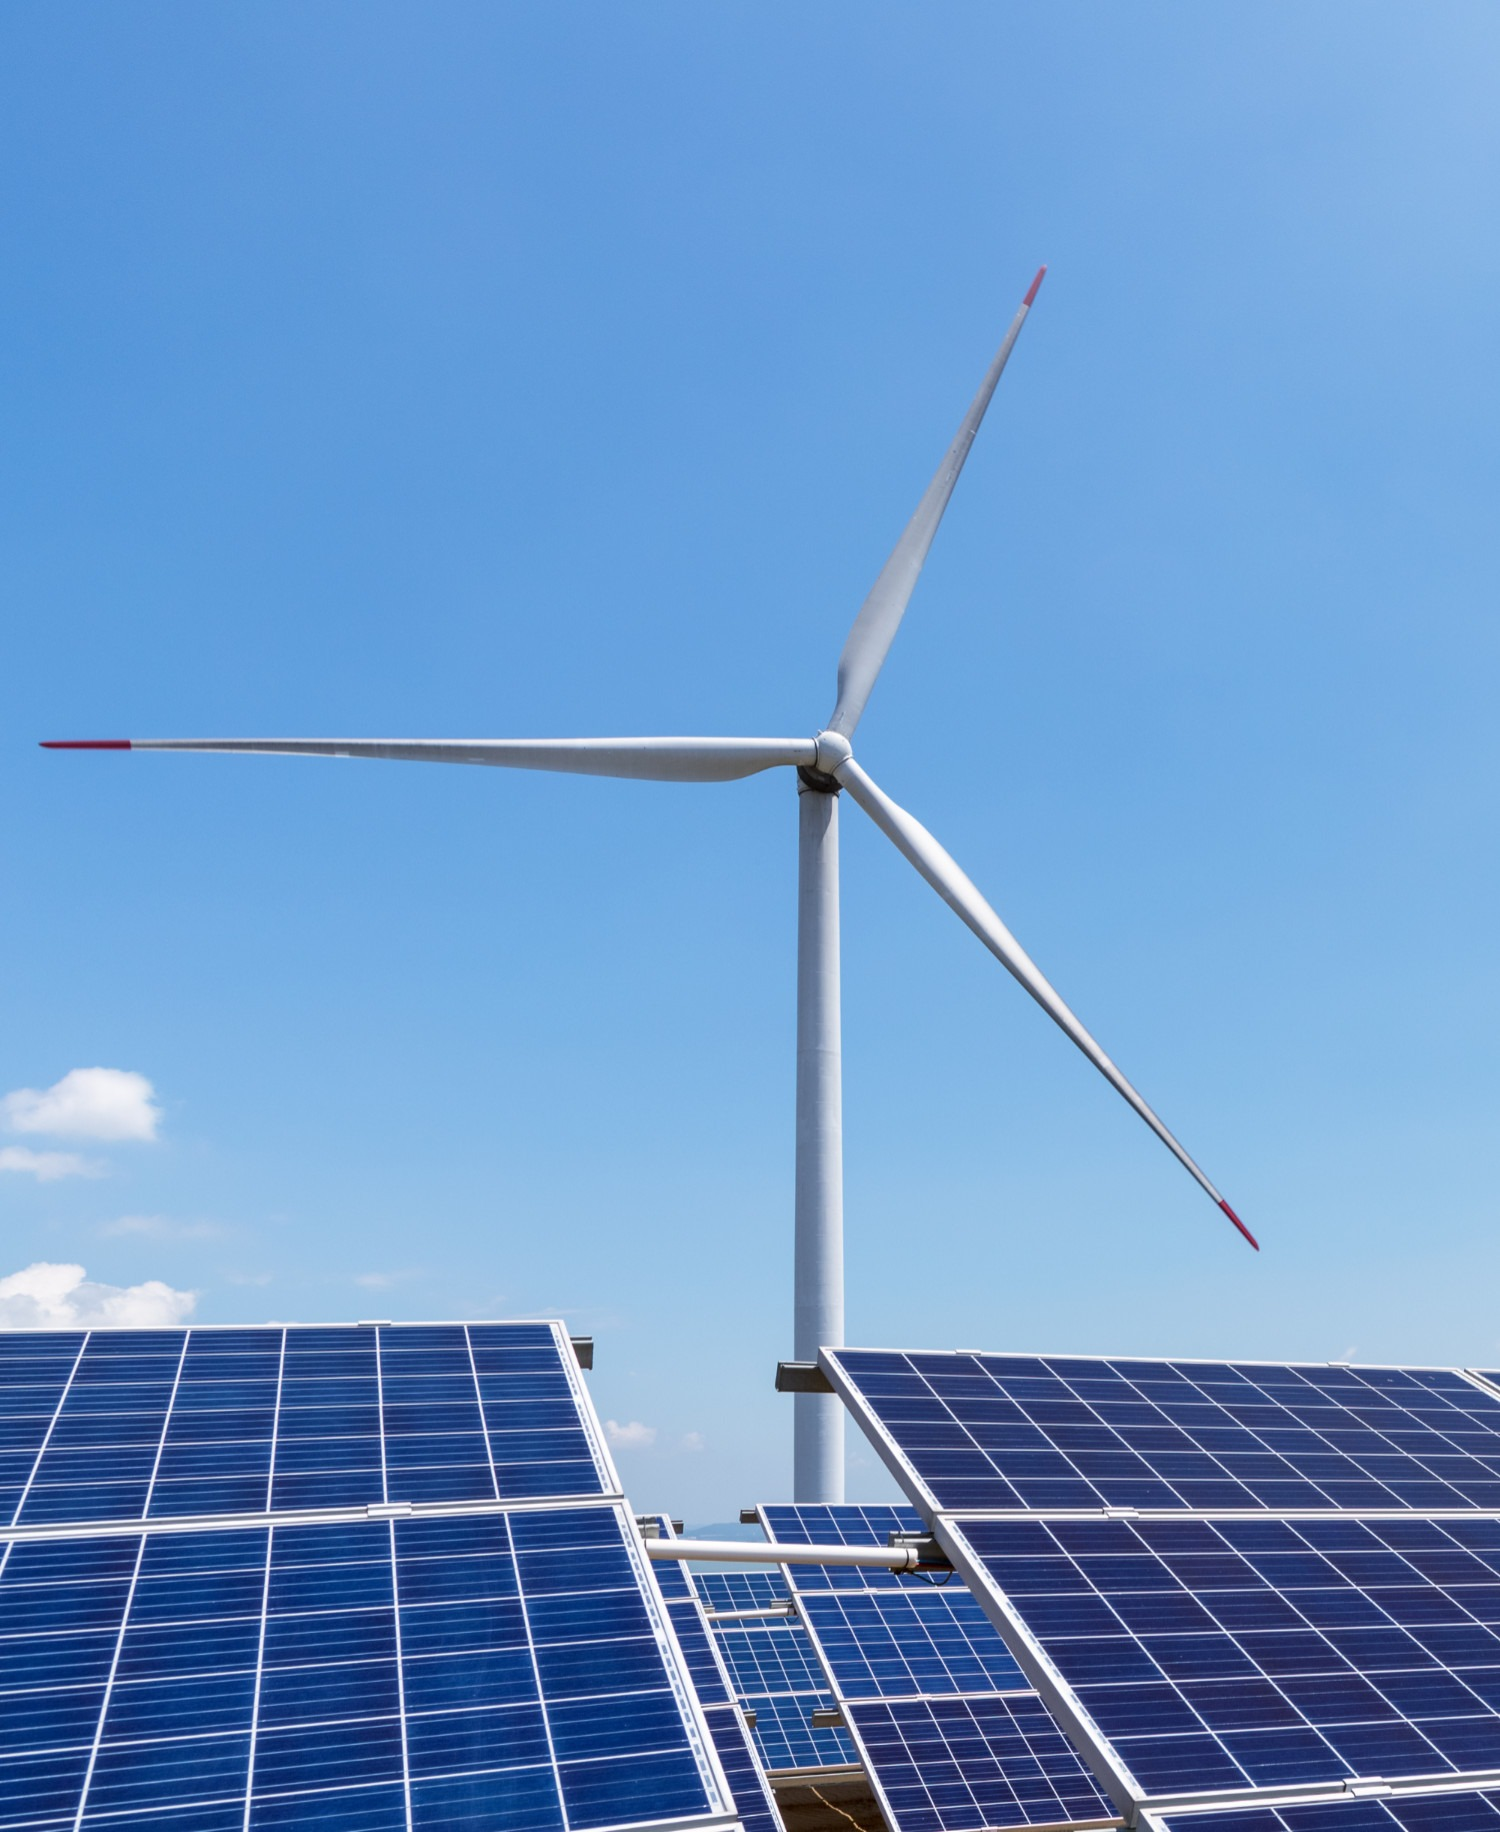 wind turbine over solar panels